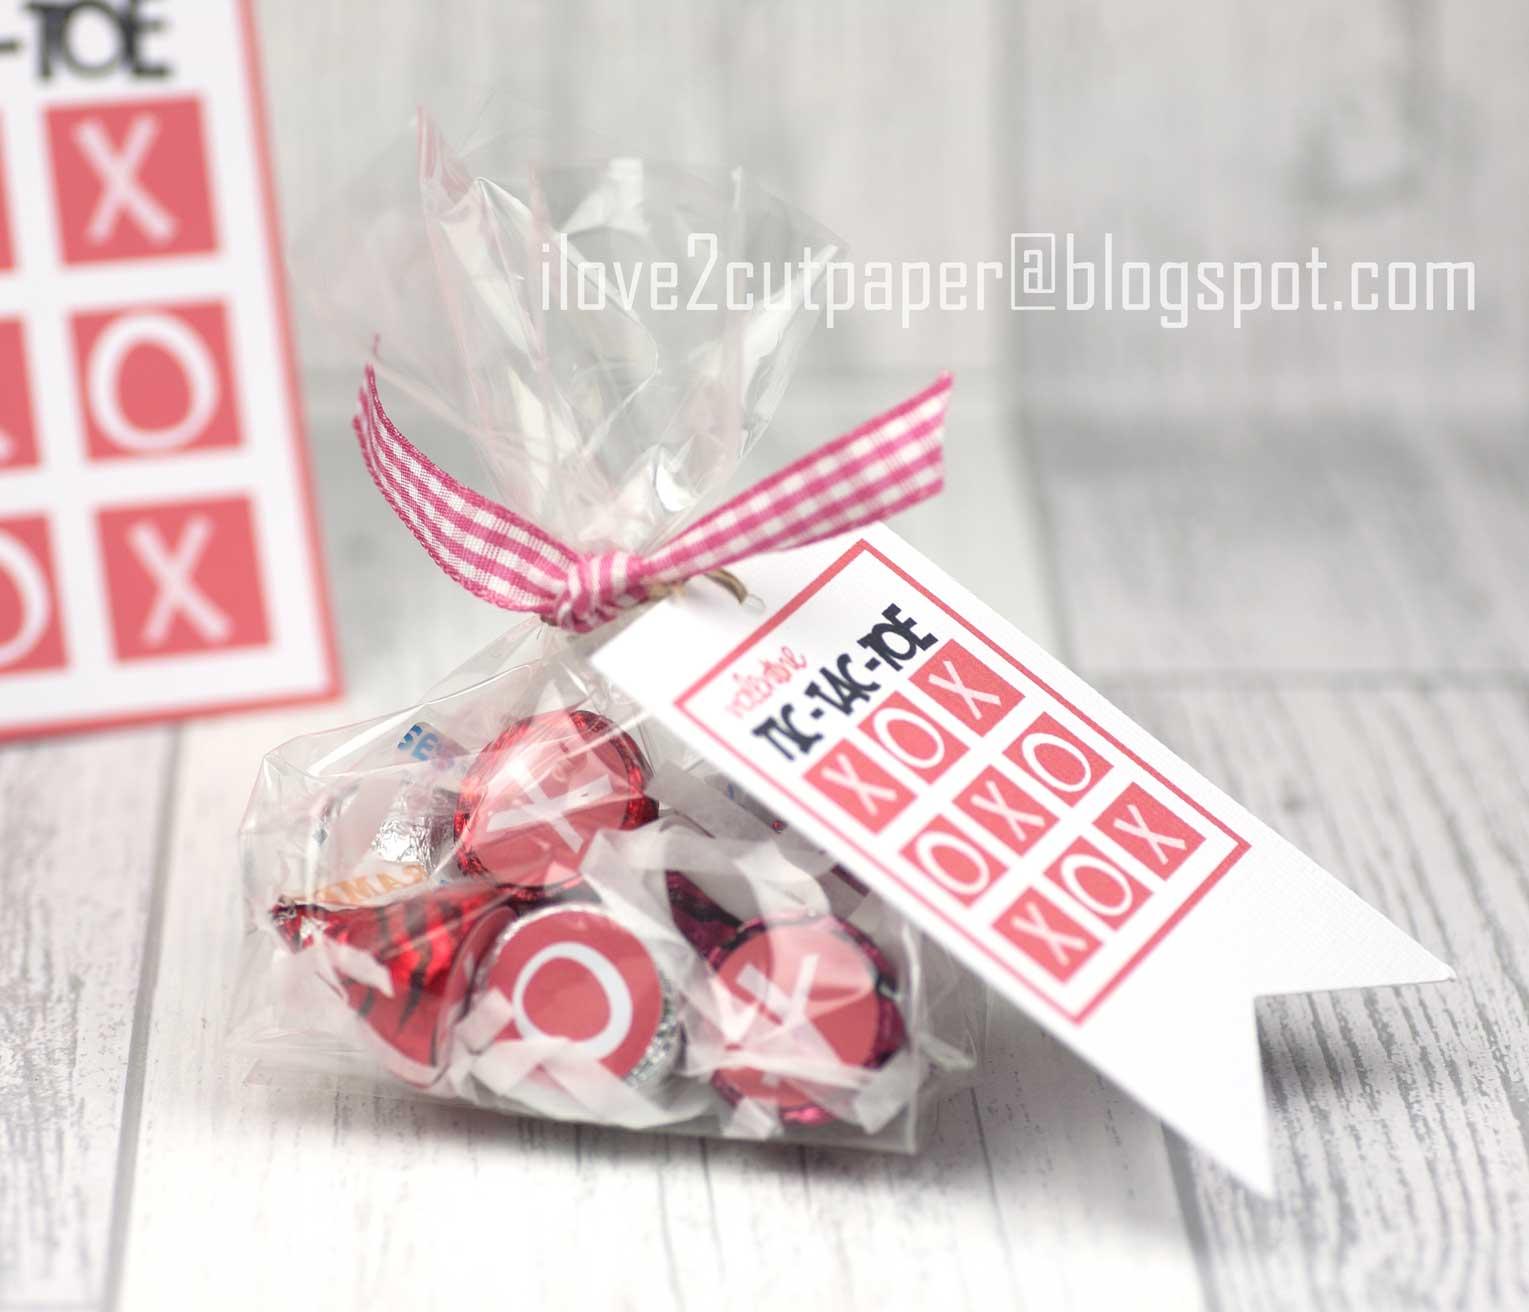 i love 2 cut paper: Tic Tac Toe card and gift set